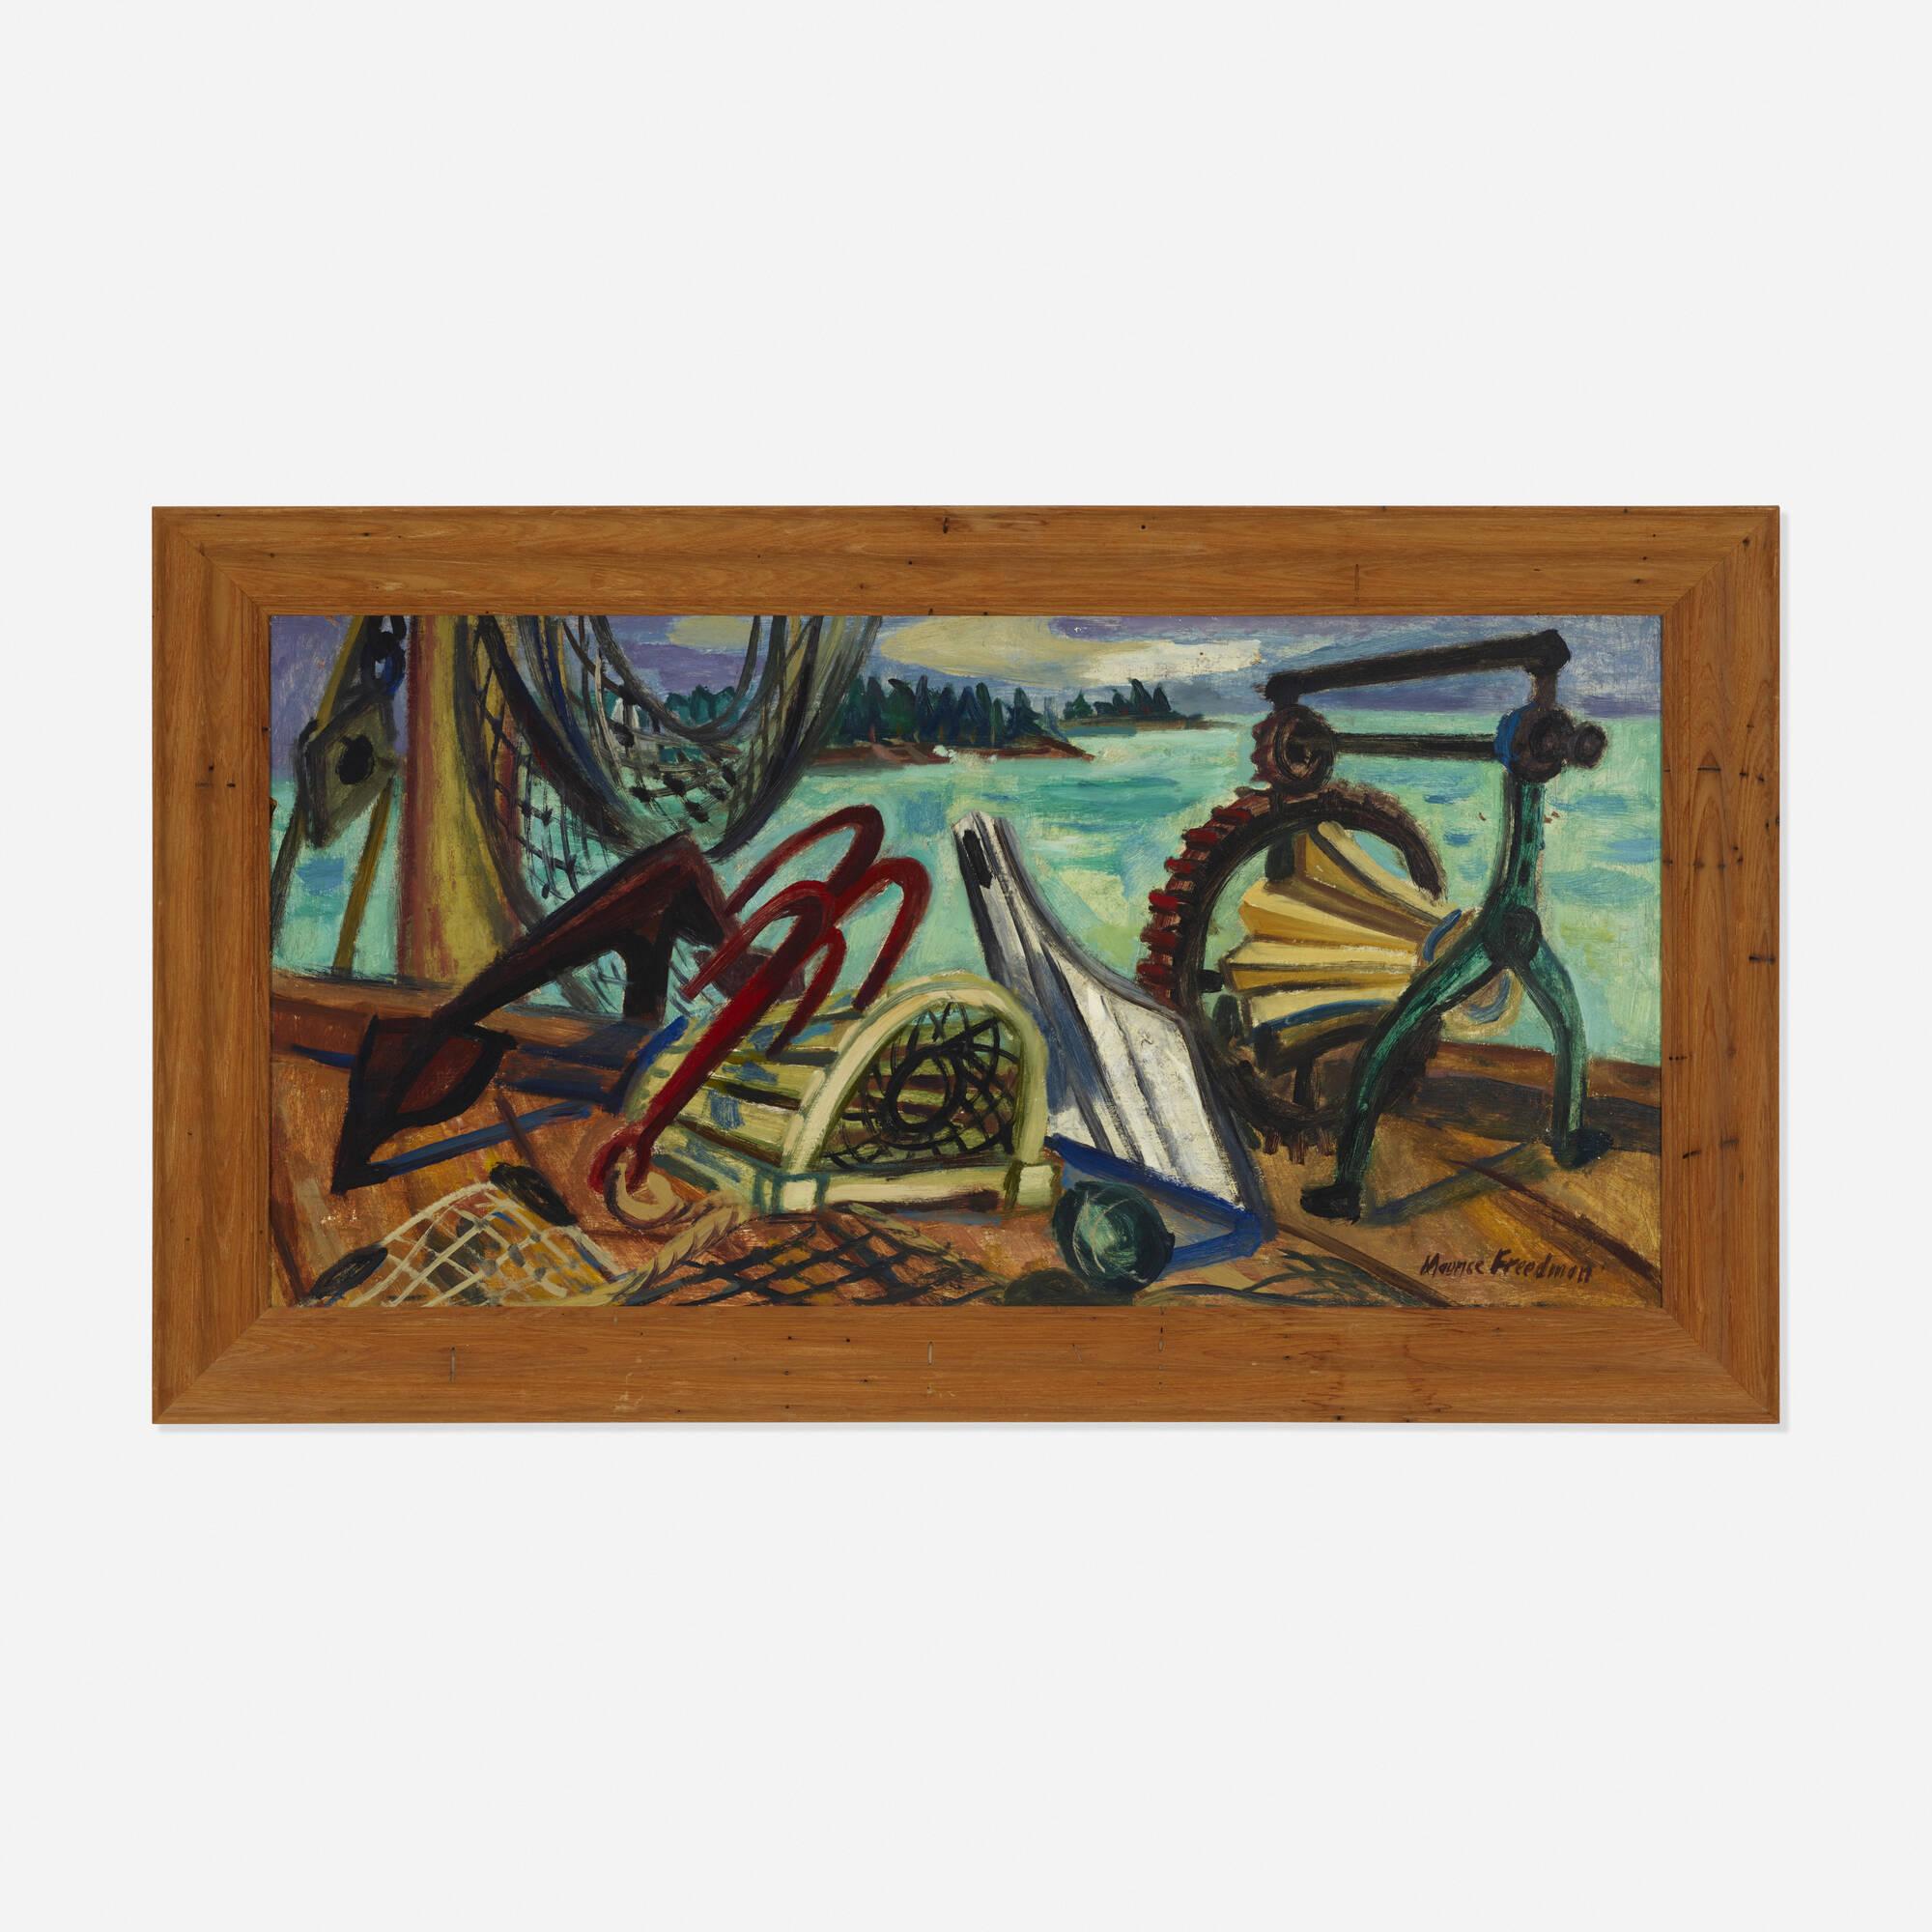 205: Maurice Freedman / Untitled (Harbor) (1 of 2)